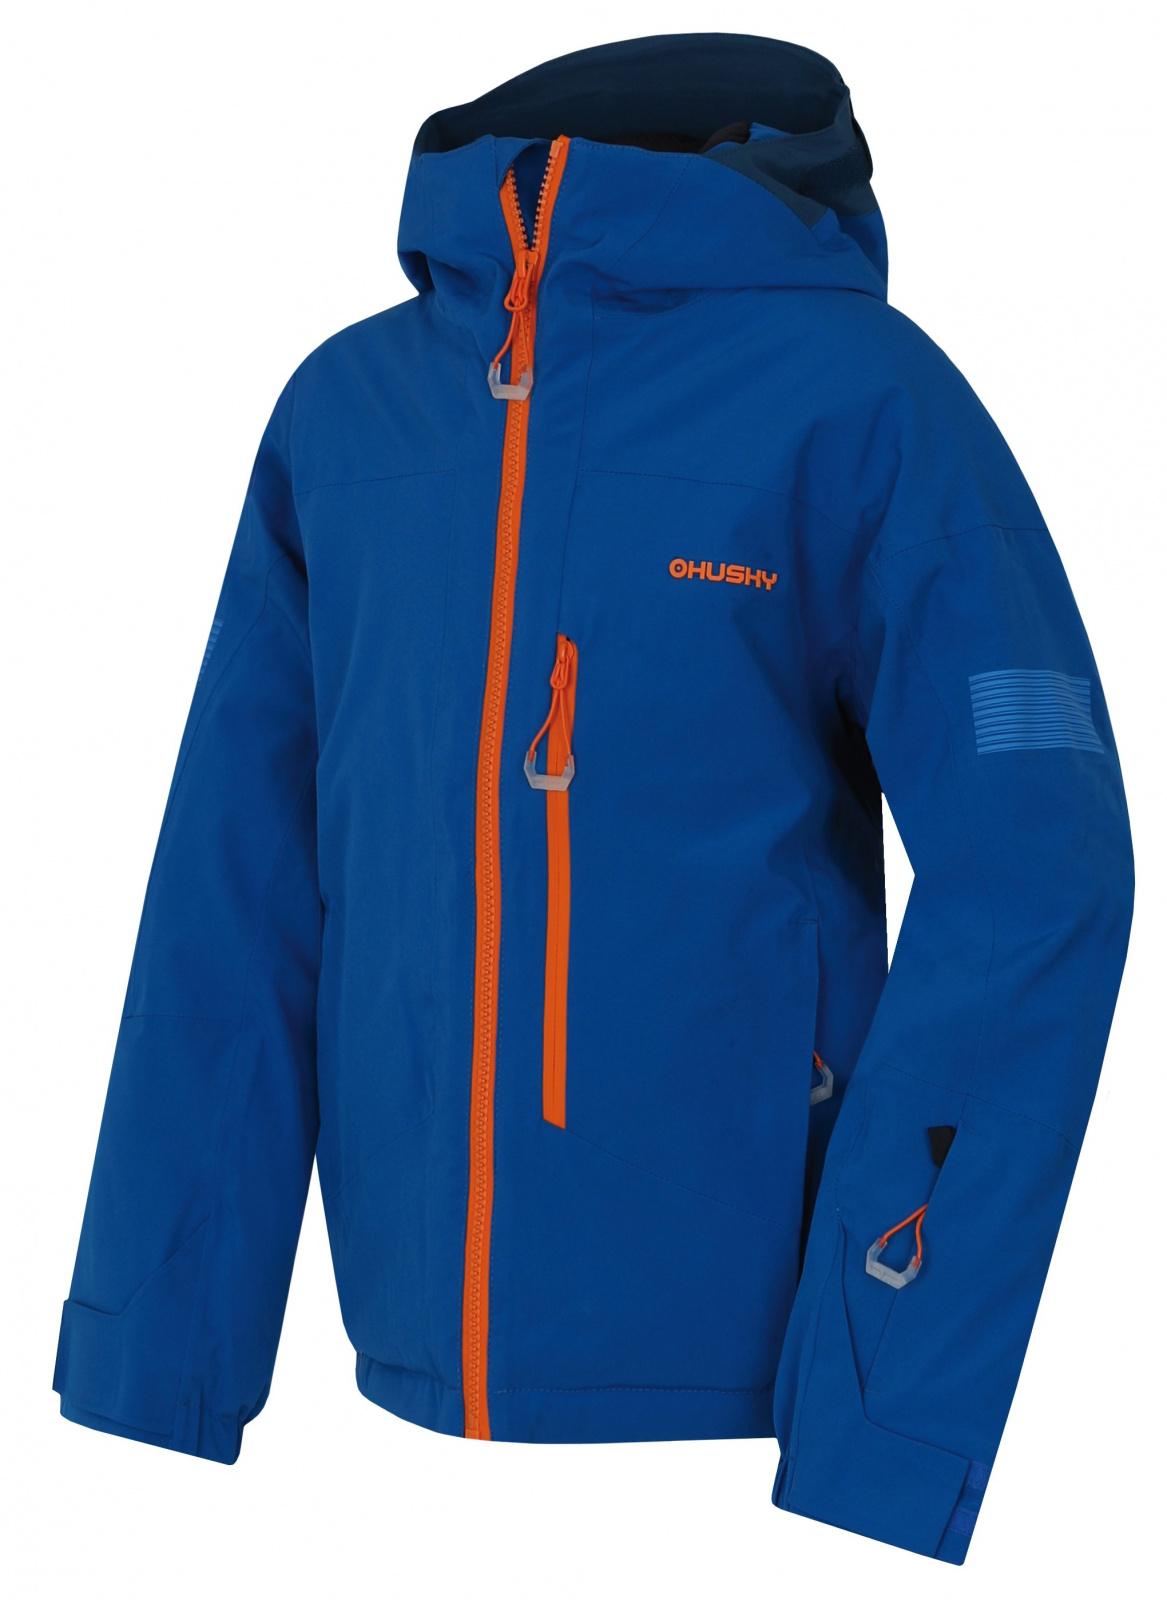 Husky Gomez Kids modrá, 134 Detská ski bunda